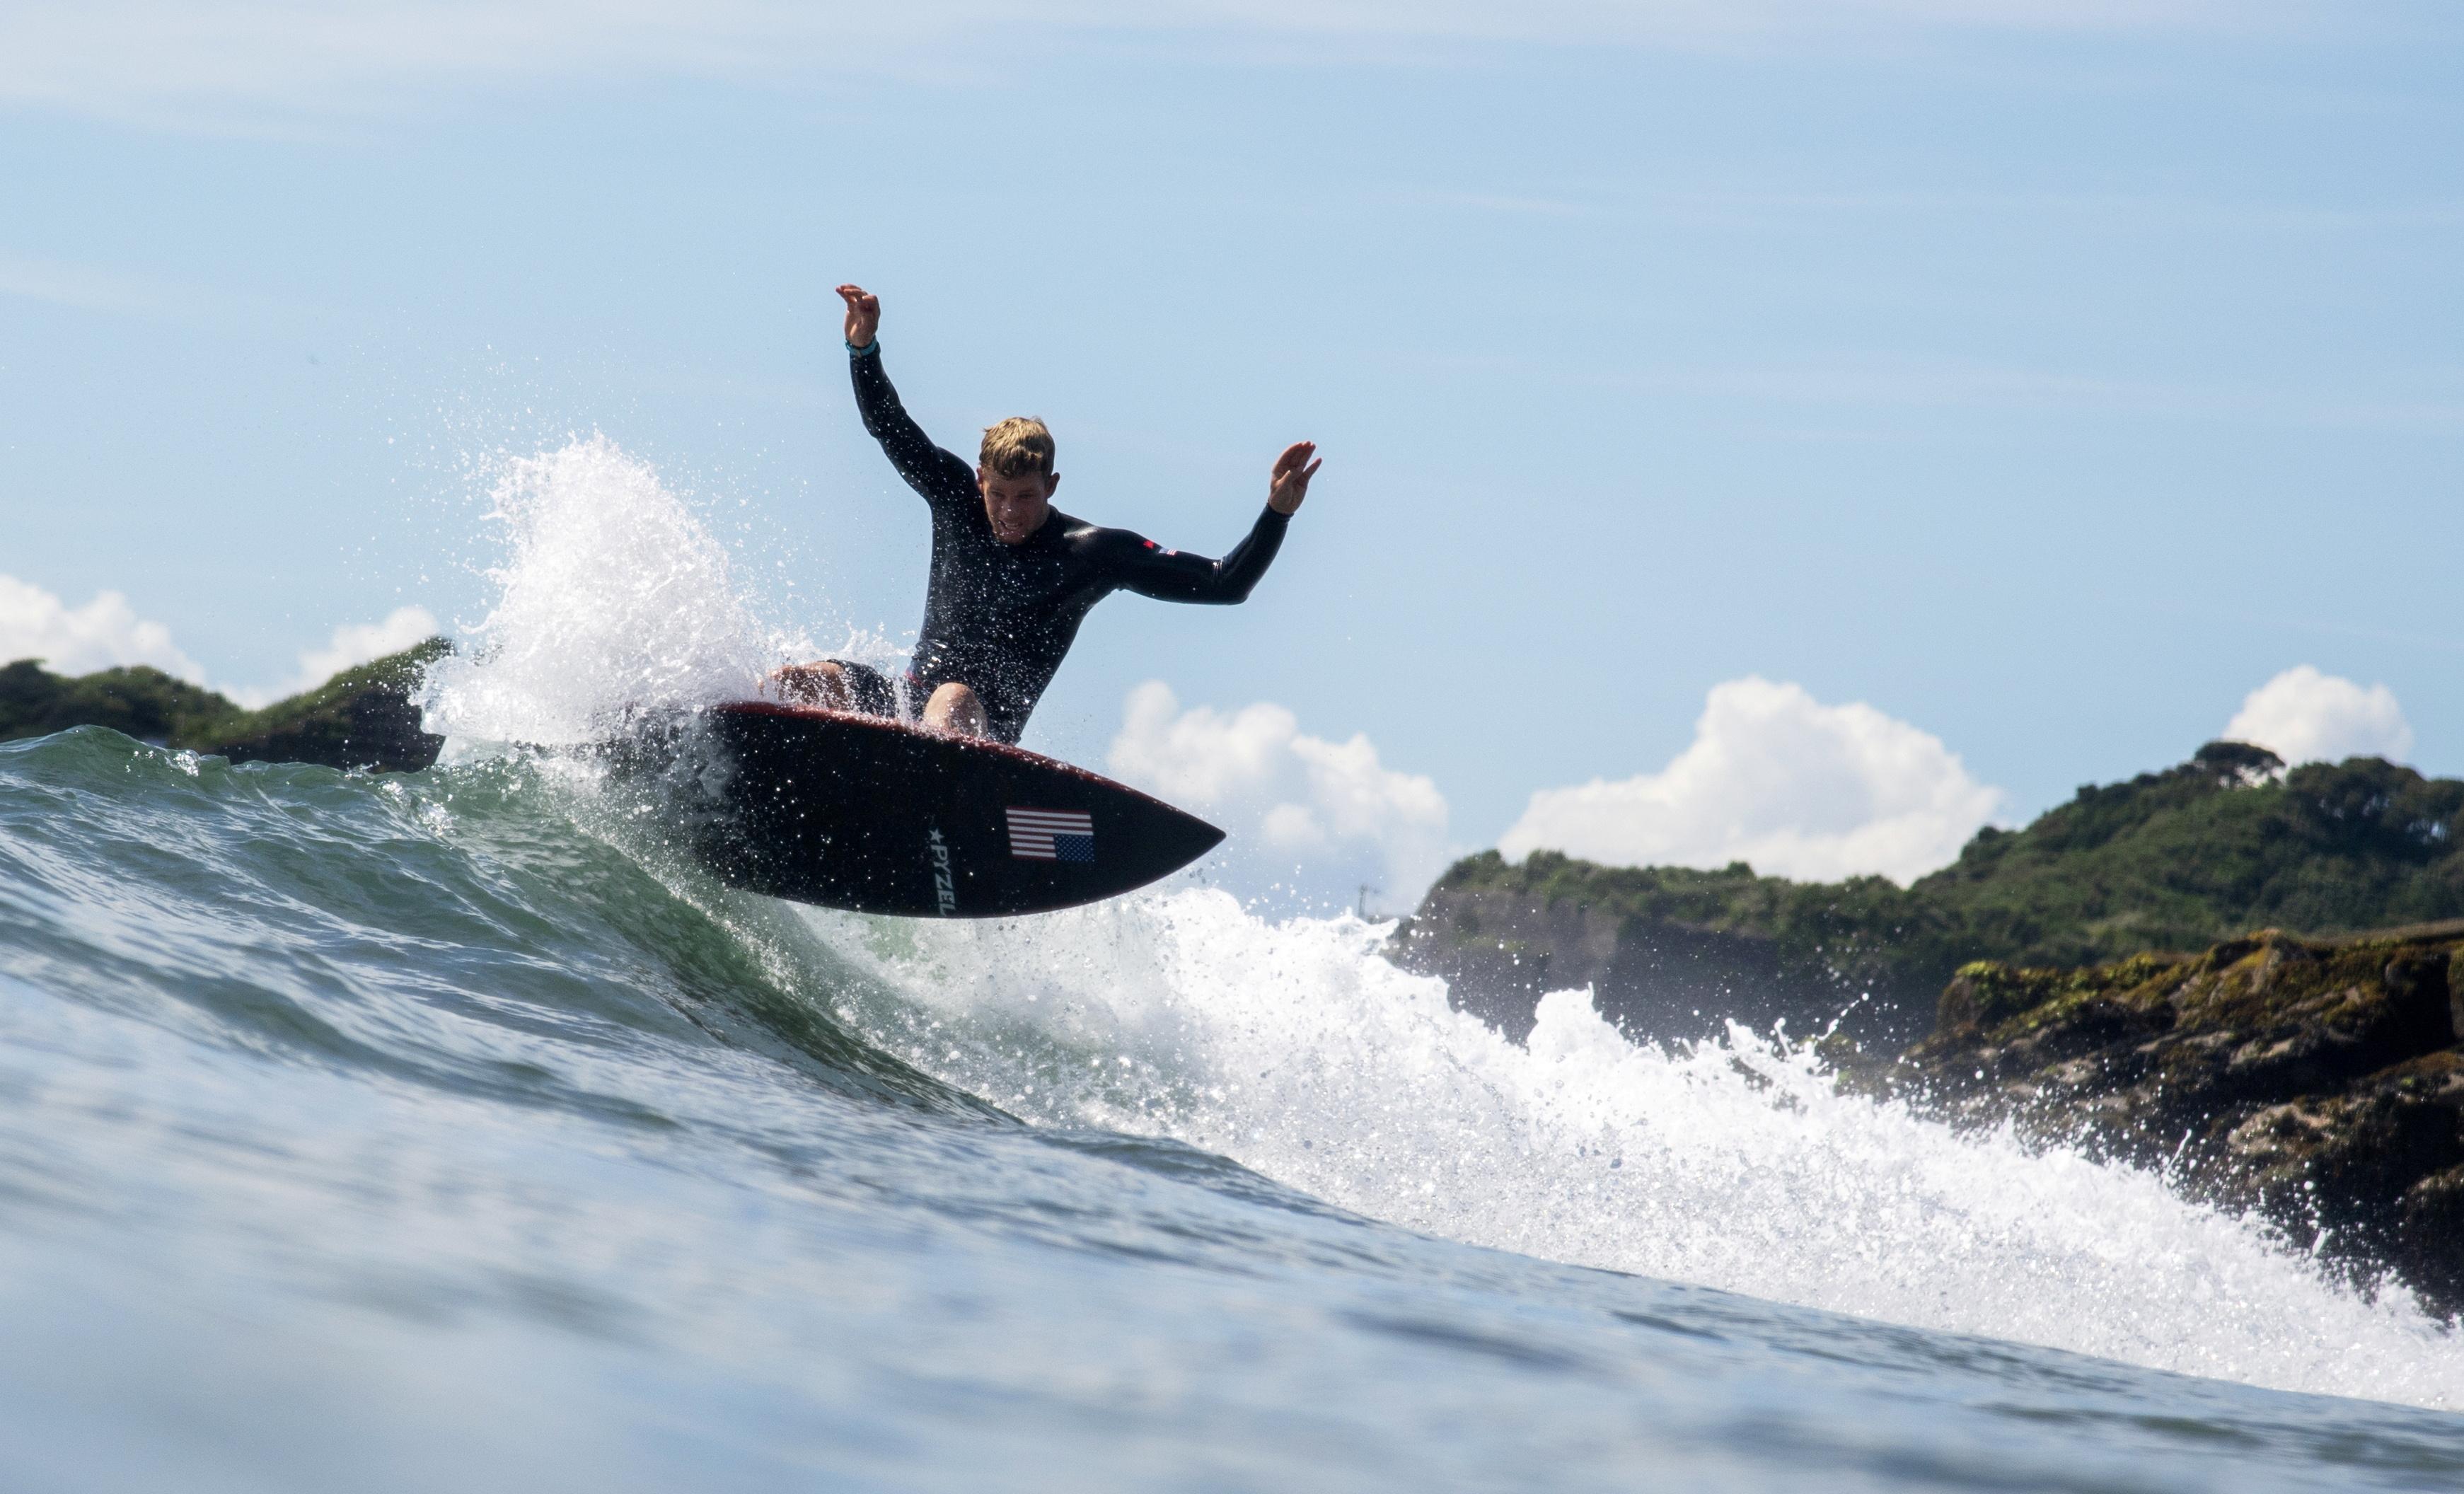 Tokyo 2020 Olympics - Surfing Training - Tsurigasaki Surfing Beach, Tokyo, Japan - July 23, 2021 John John Florence of the United States during training Pool via Reuters/Olivier Morin/File Photo